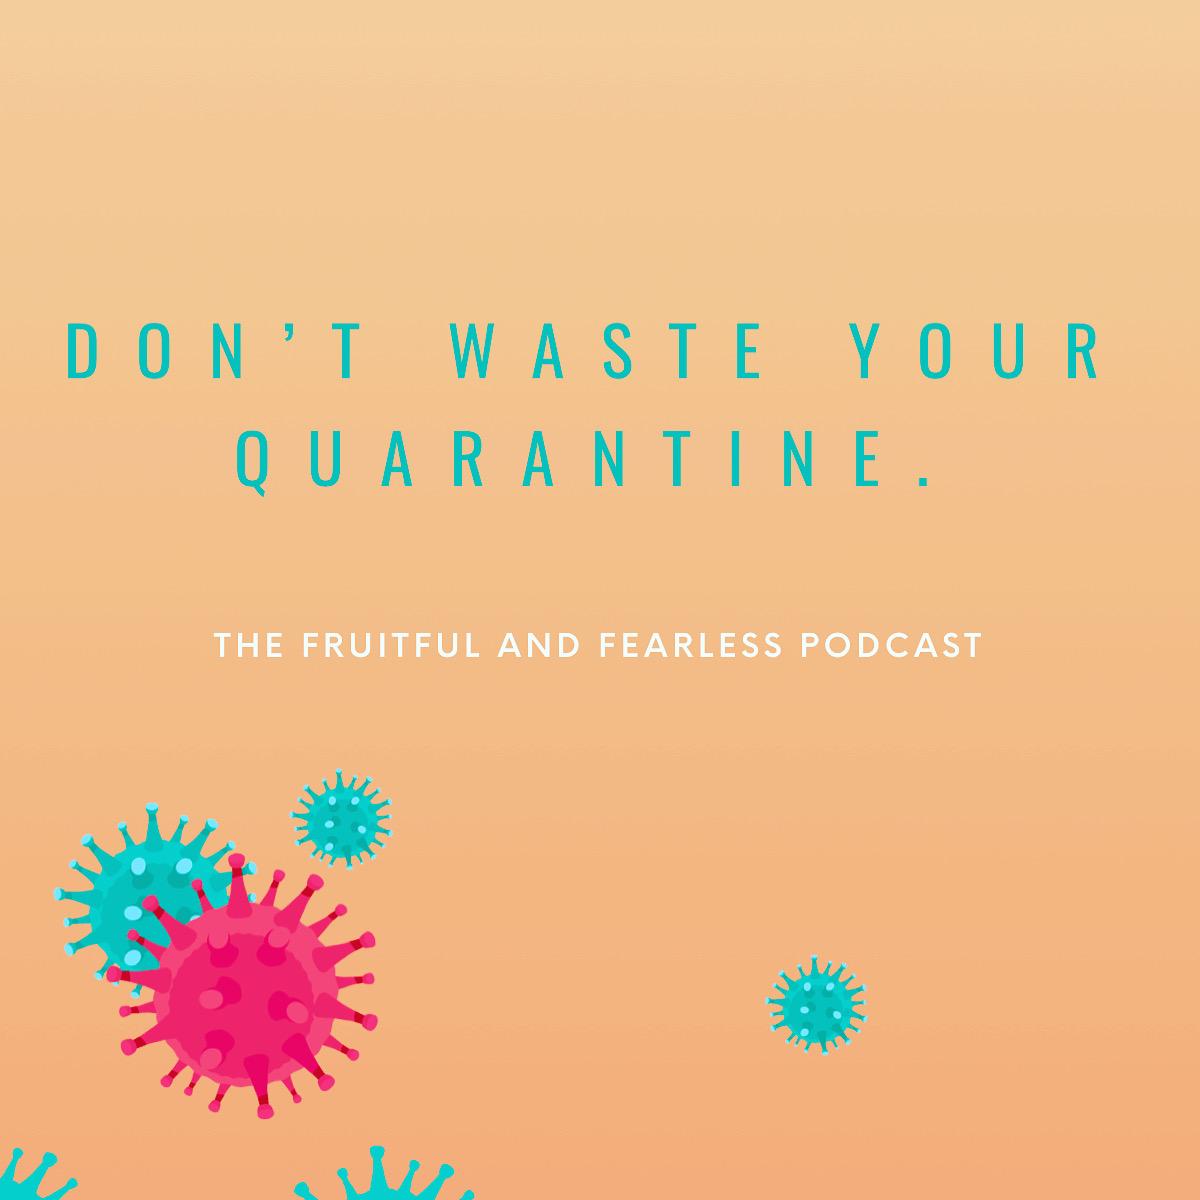 #25 Don't Waste Your Quarantine